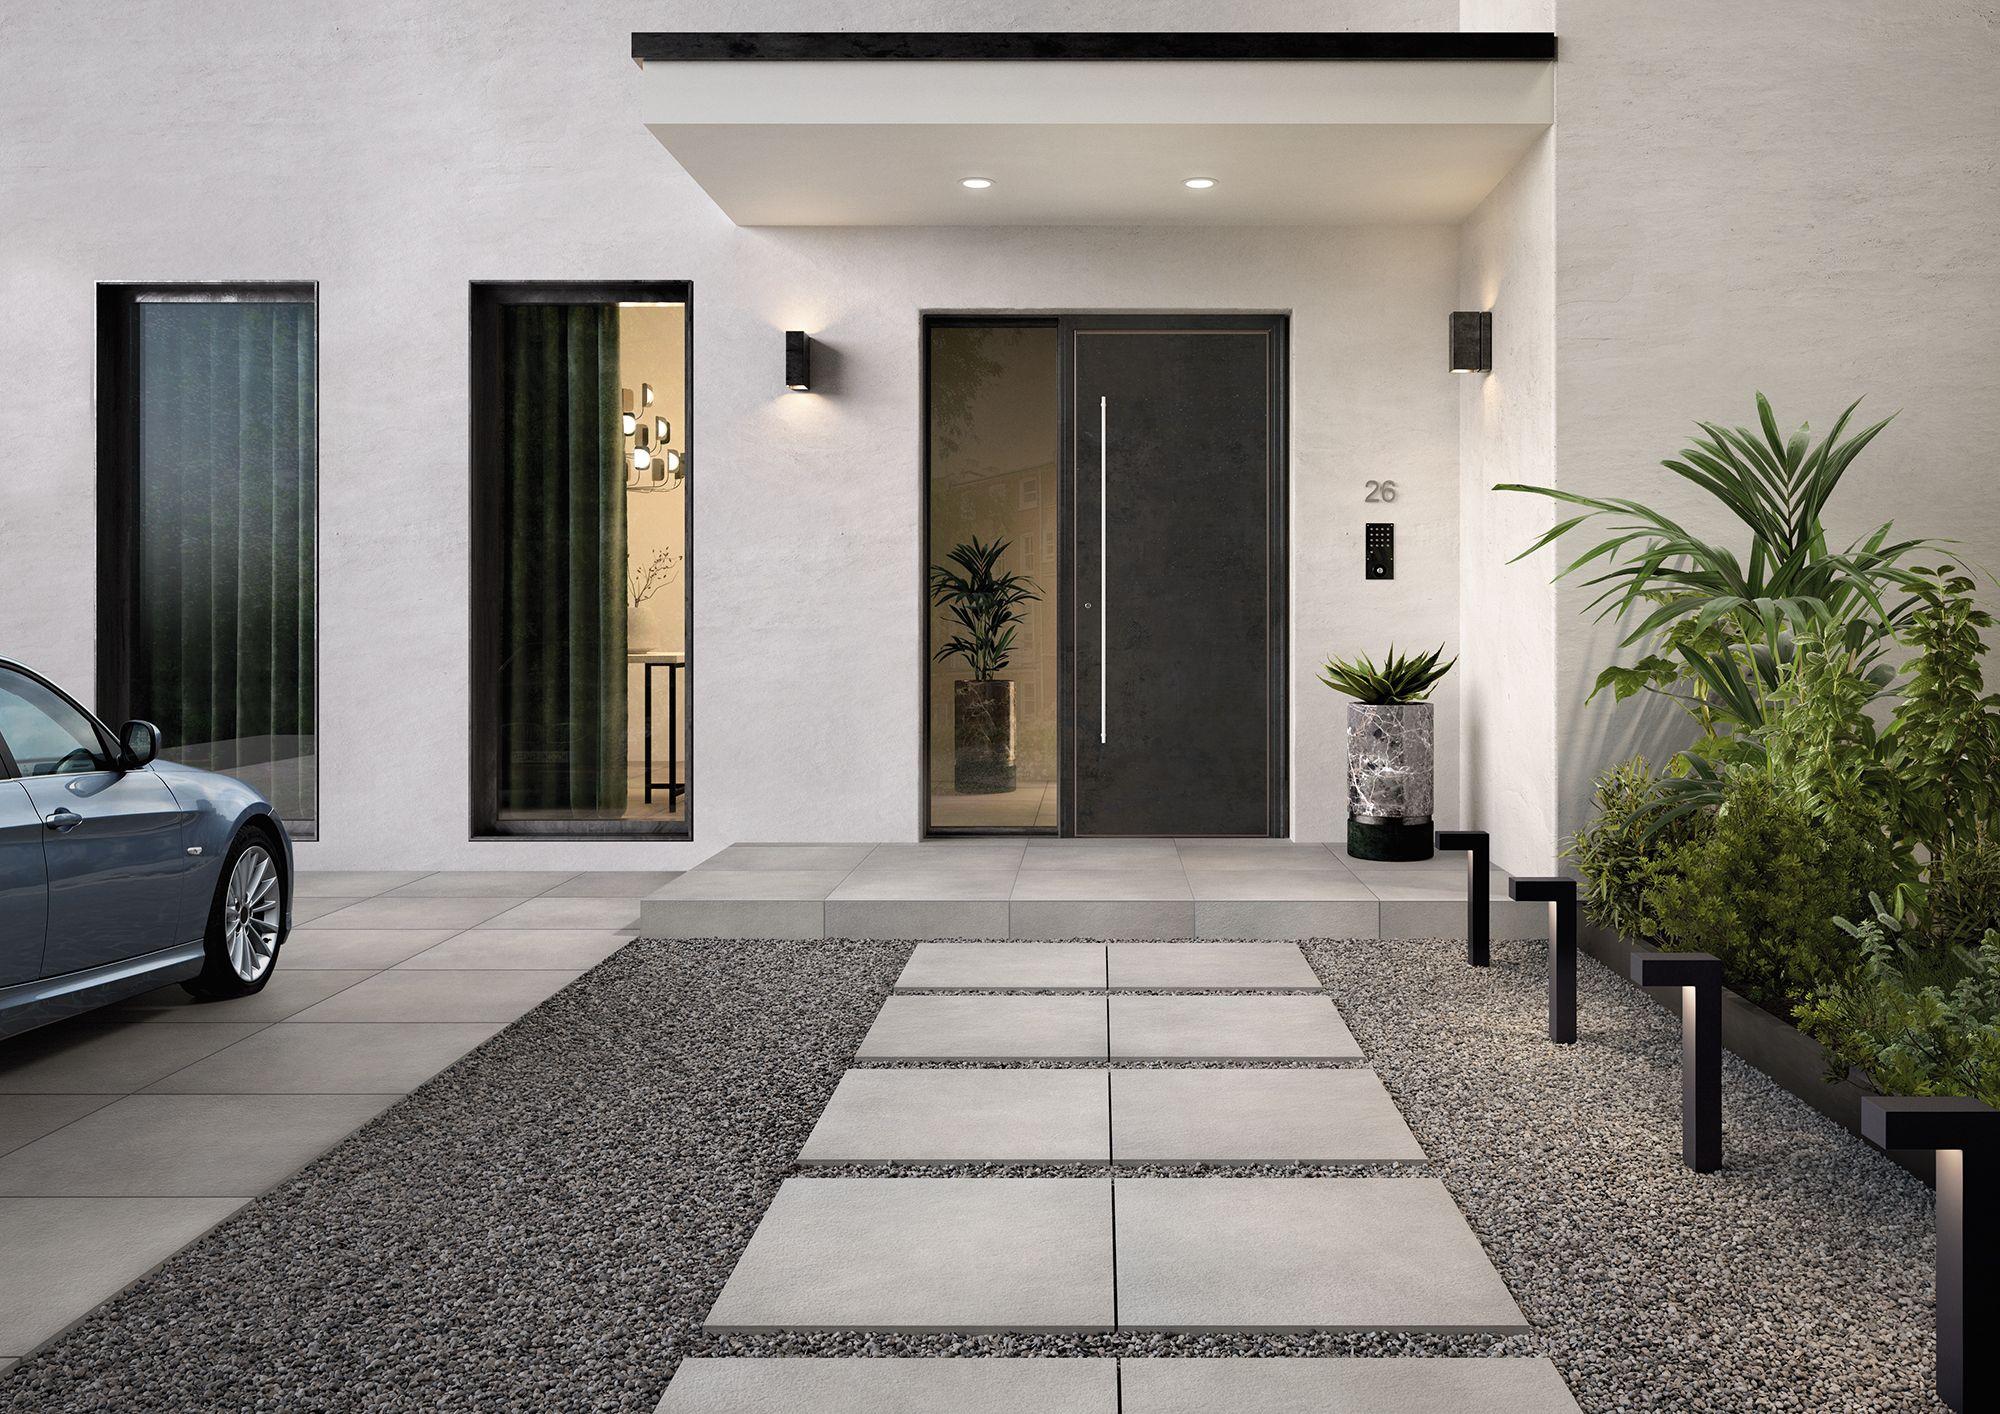 Outdoor Tile Inspiration Modern Landscaping House Exterior